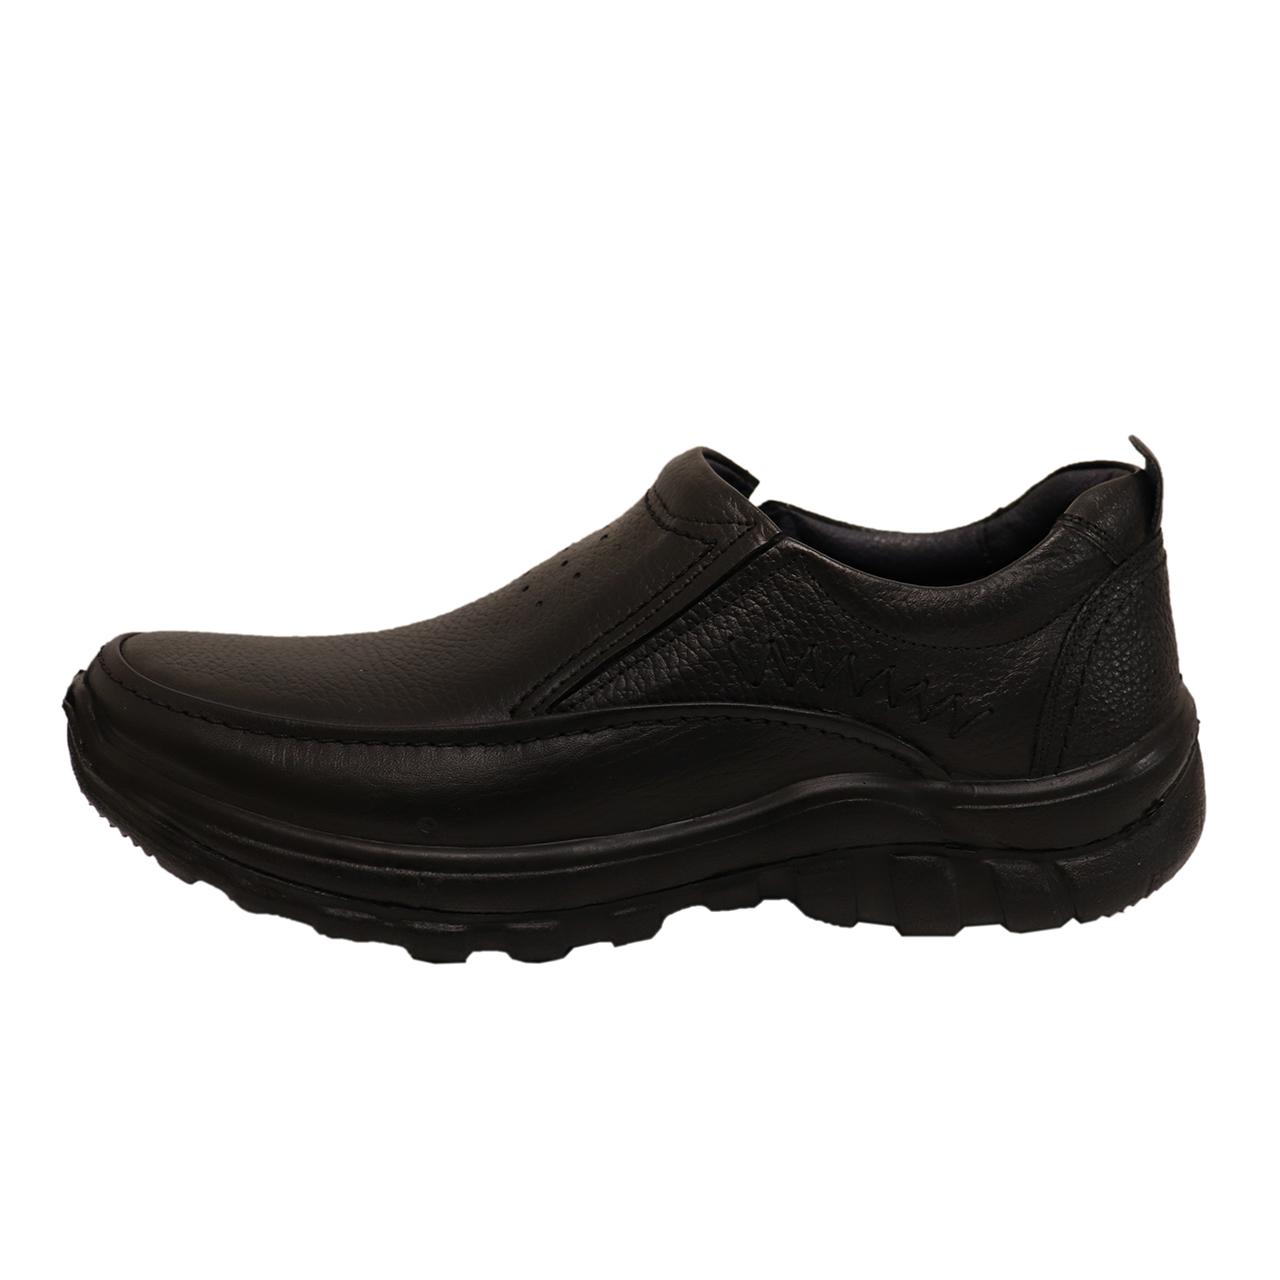 کفش روزمره مردانه مدل 1023